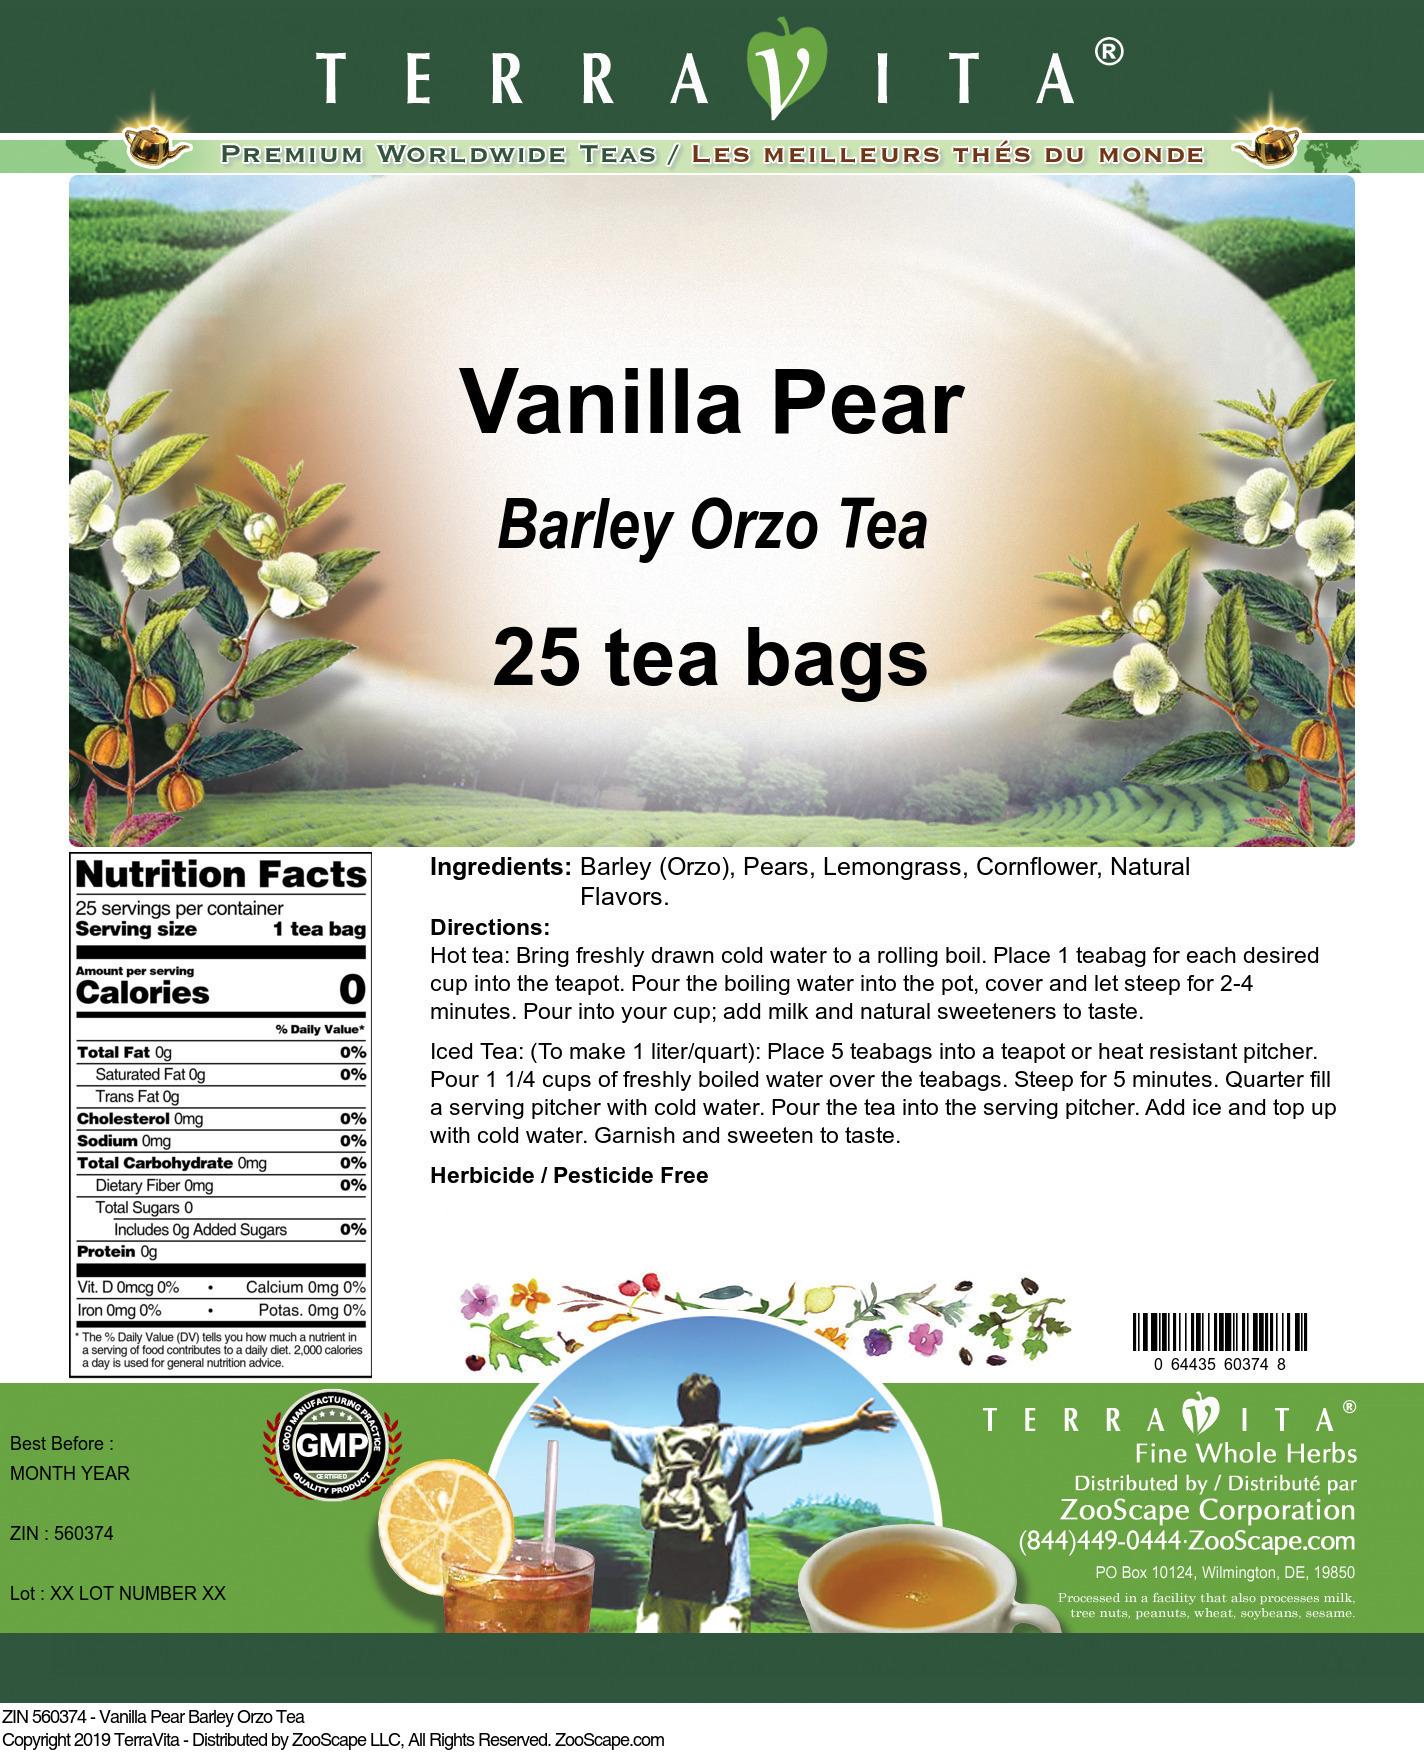 Vanilla Pear Barley Orzo